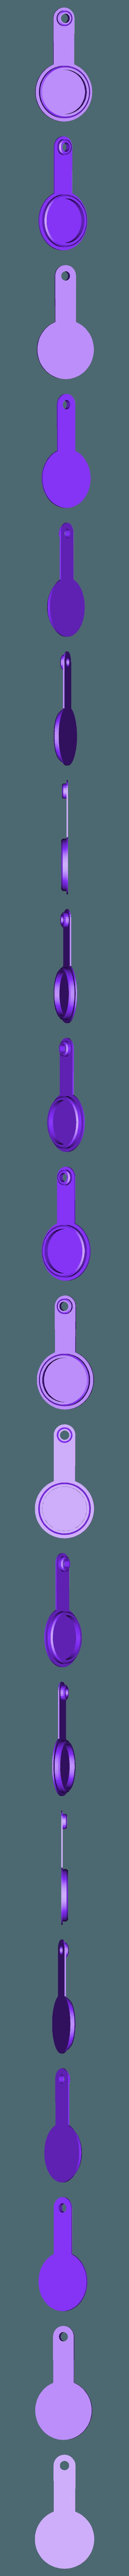 BARCELONA_Macho_Slim.stl Télécharger fichier STL gratuit LLAVERO CELTA DE VIGO, REAL MADRID, BARCELONA, ATLETICO DE MADRID Y TORTUGA (NFC) • Modèle imprimable en 3D, celtarra12